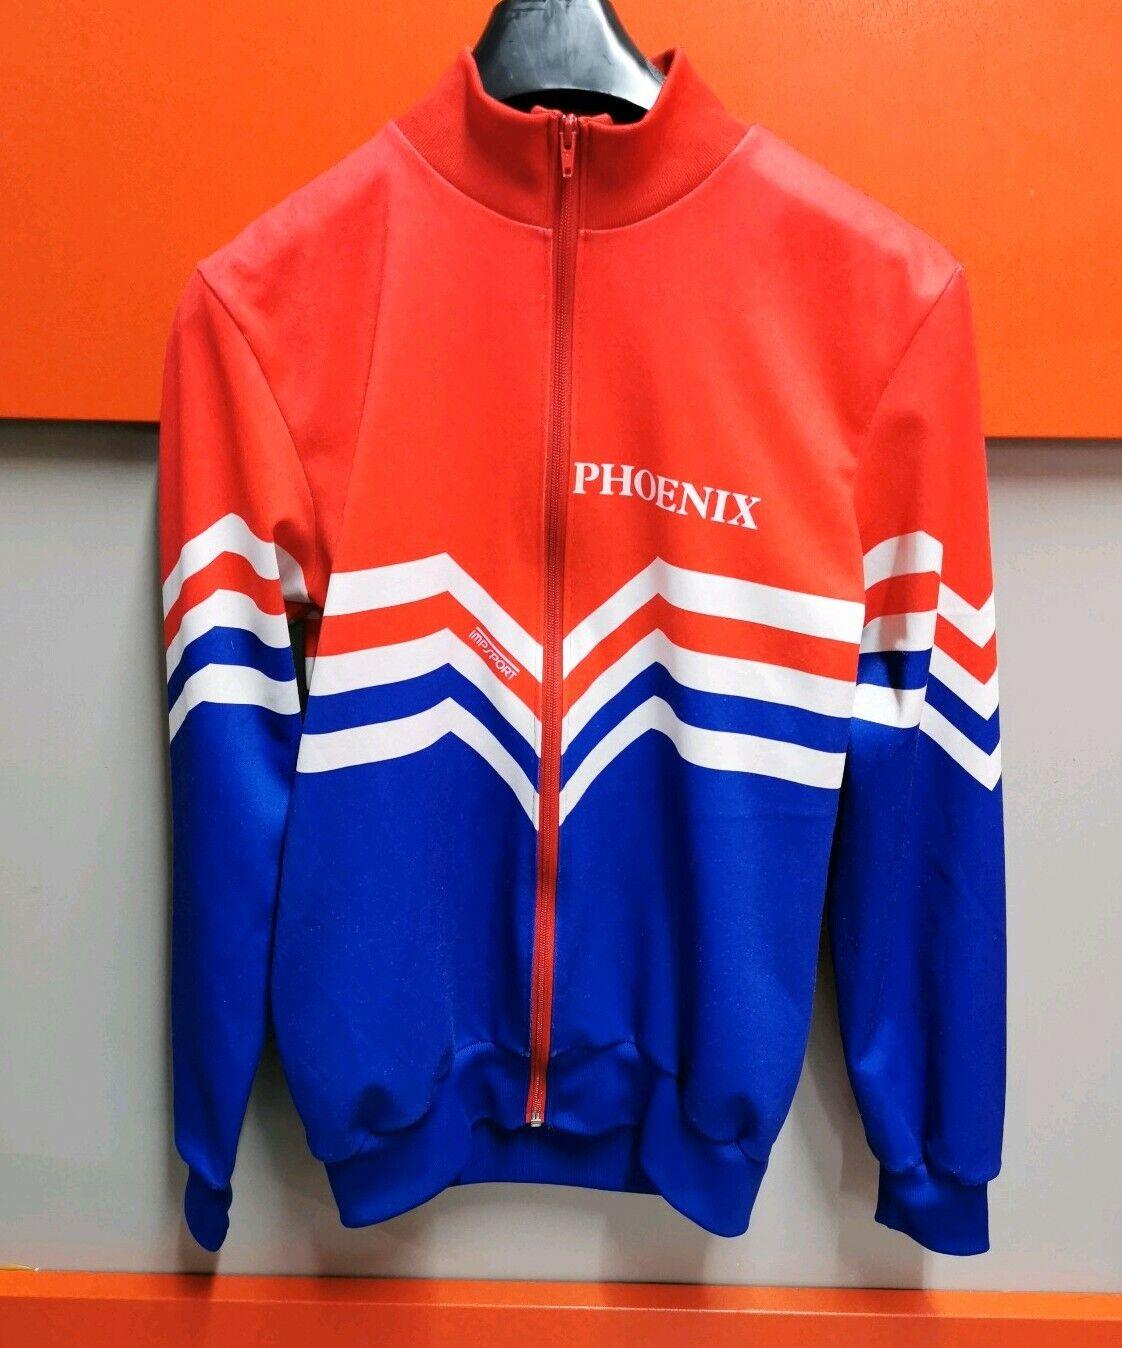 Vintage Retro Impsport Phoenix Cycling over Jacket 1980's Size Adult Medium